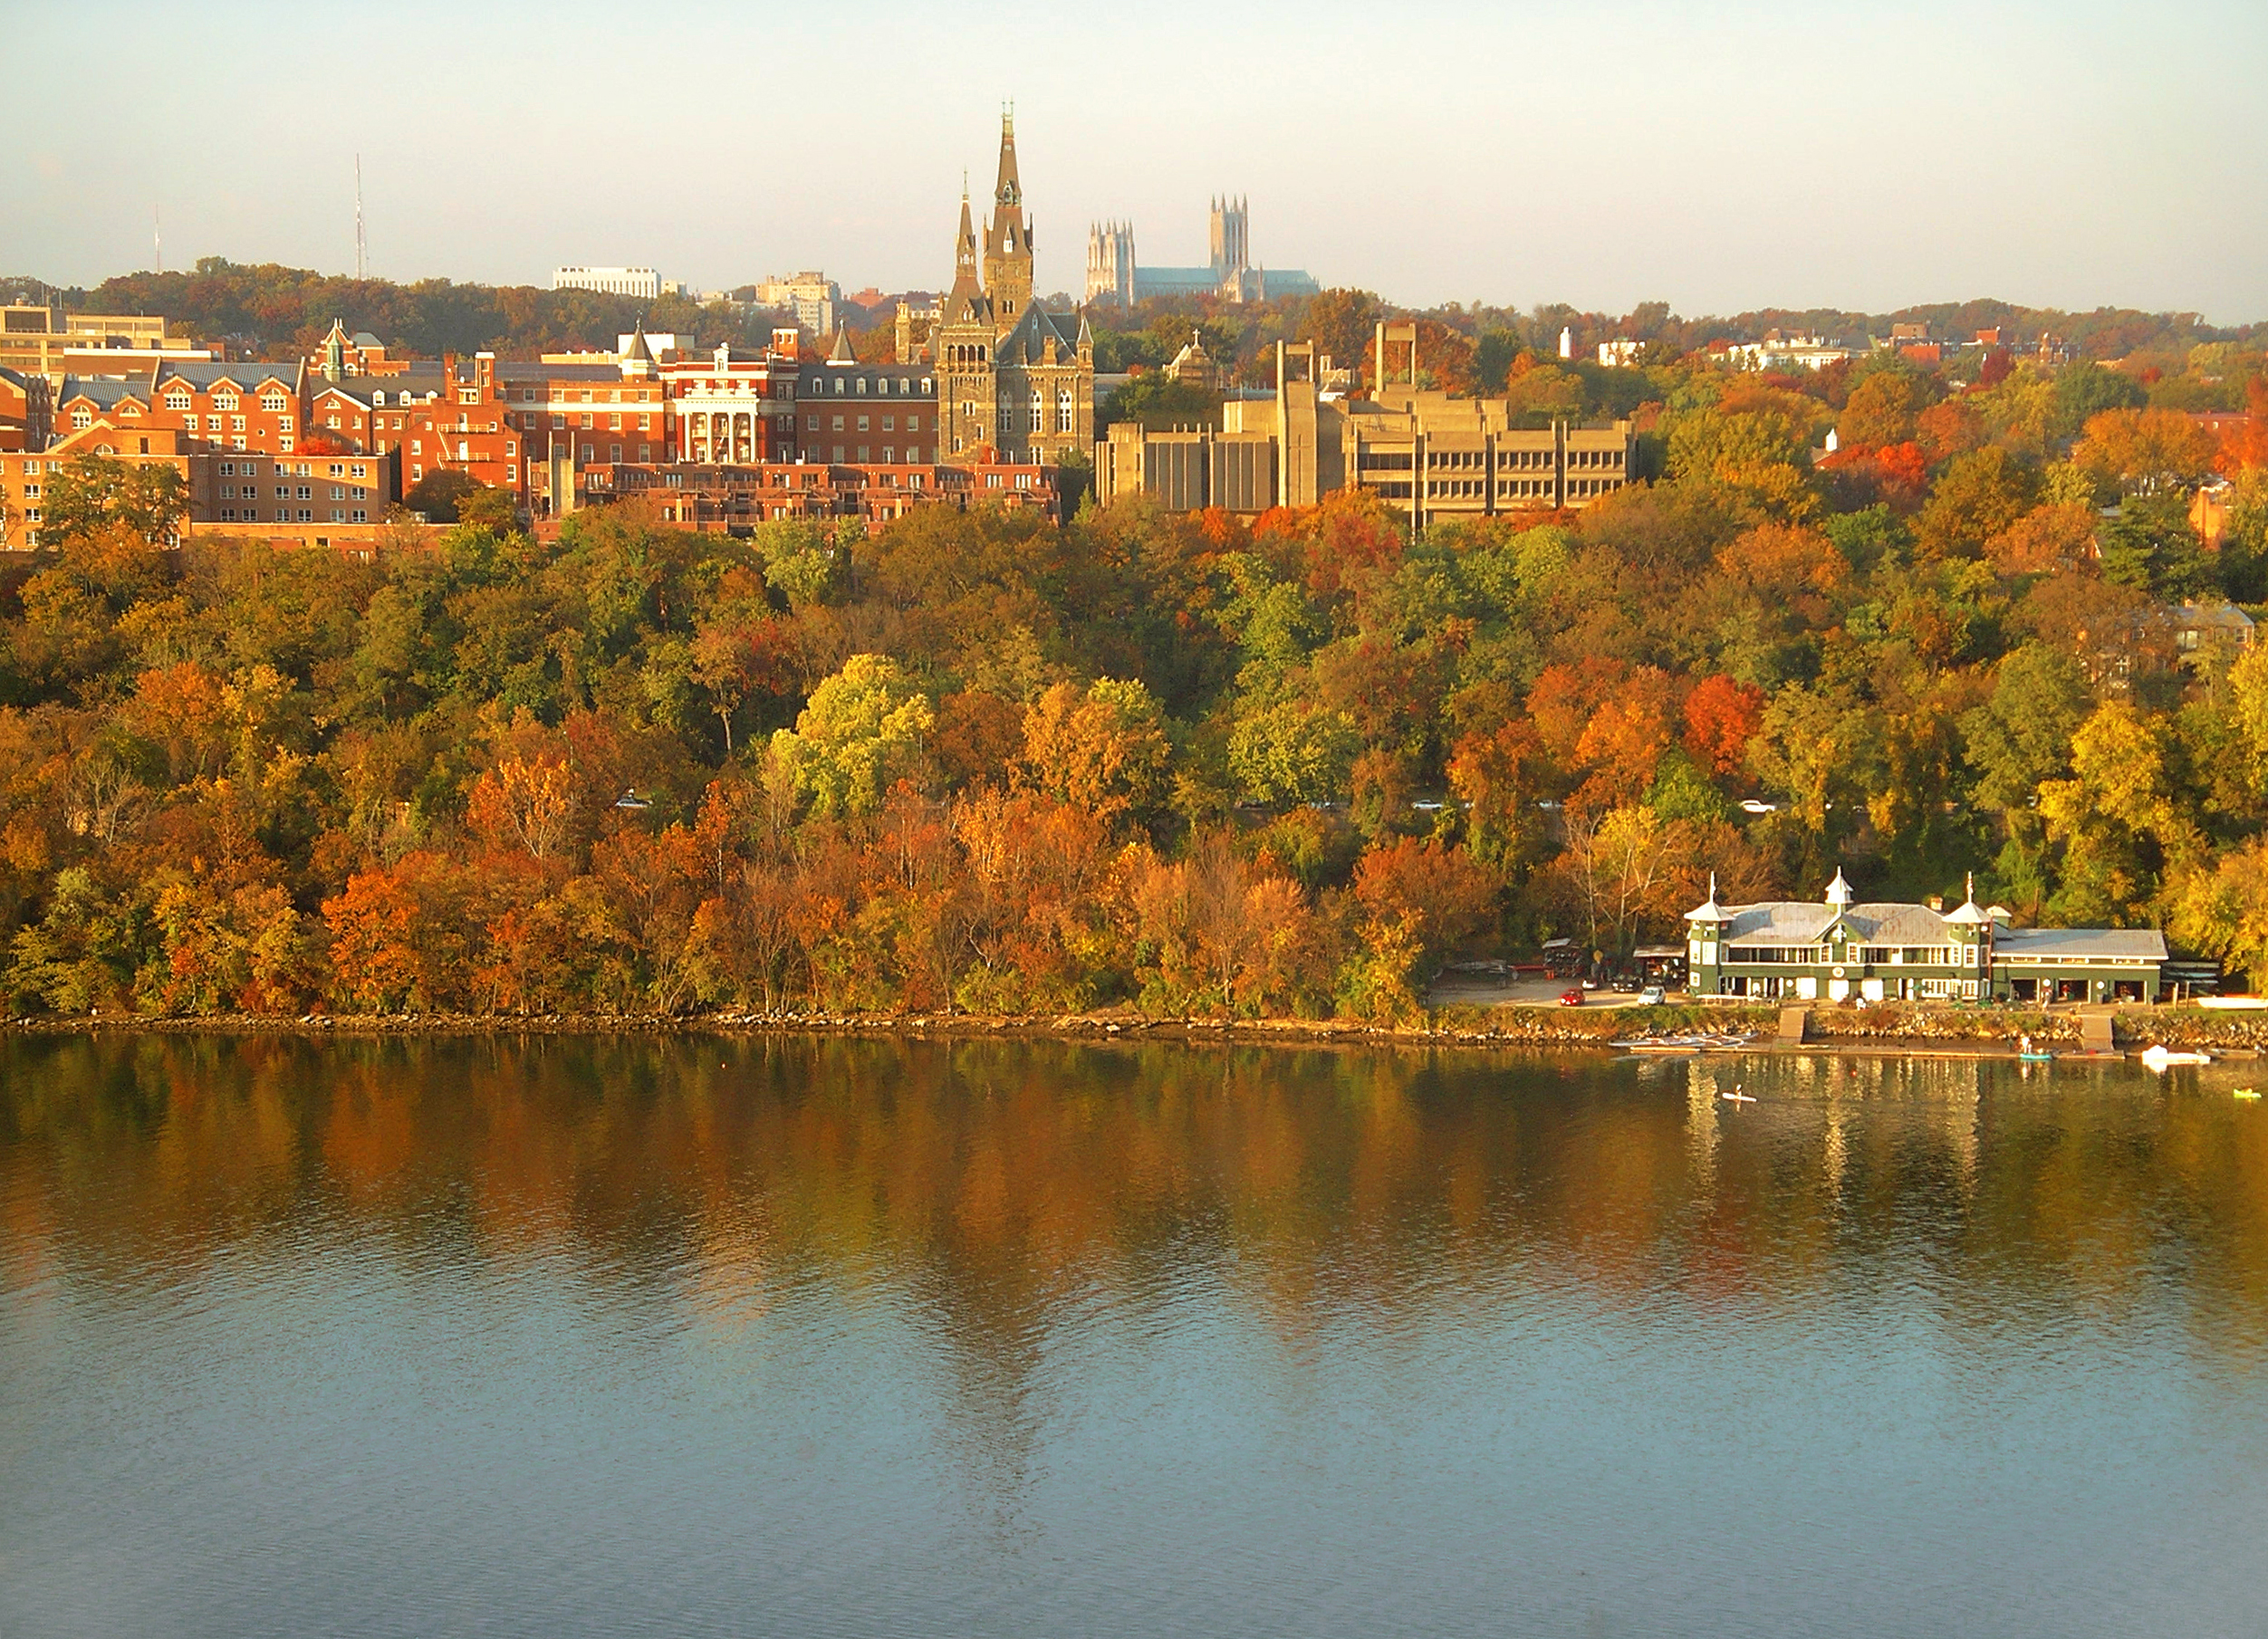 File:Georgetown Riverview.jpg - Wikimedia Commons